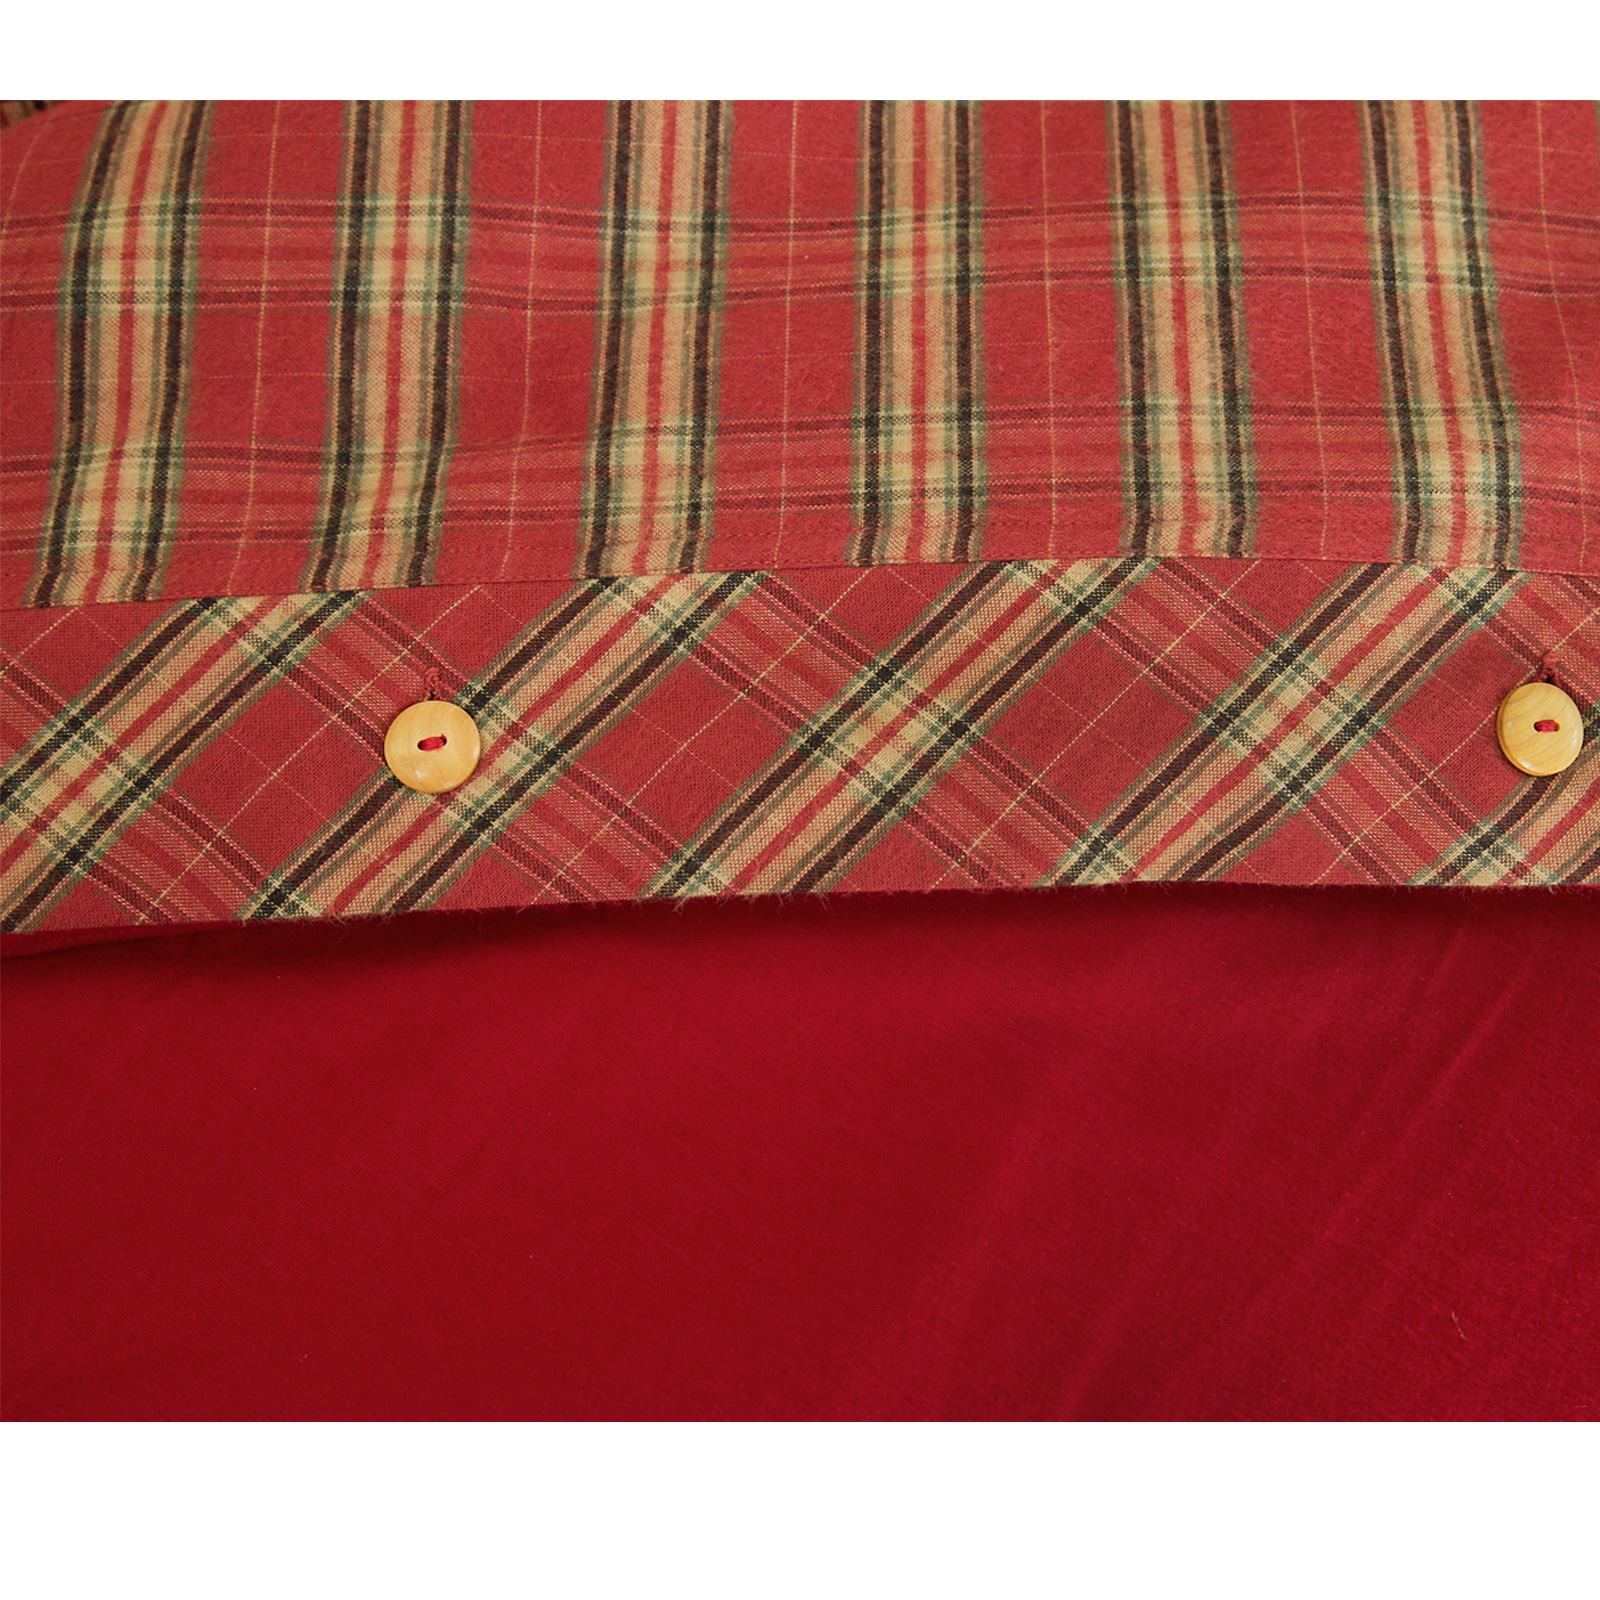 Highland-Tartan-Cuadros-Tejido-De-Algodon-Cepillado-Termico-flanelita-duvet-cover-set miniatura 9